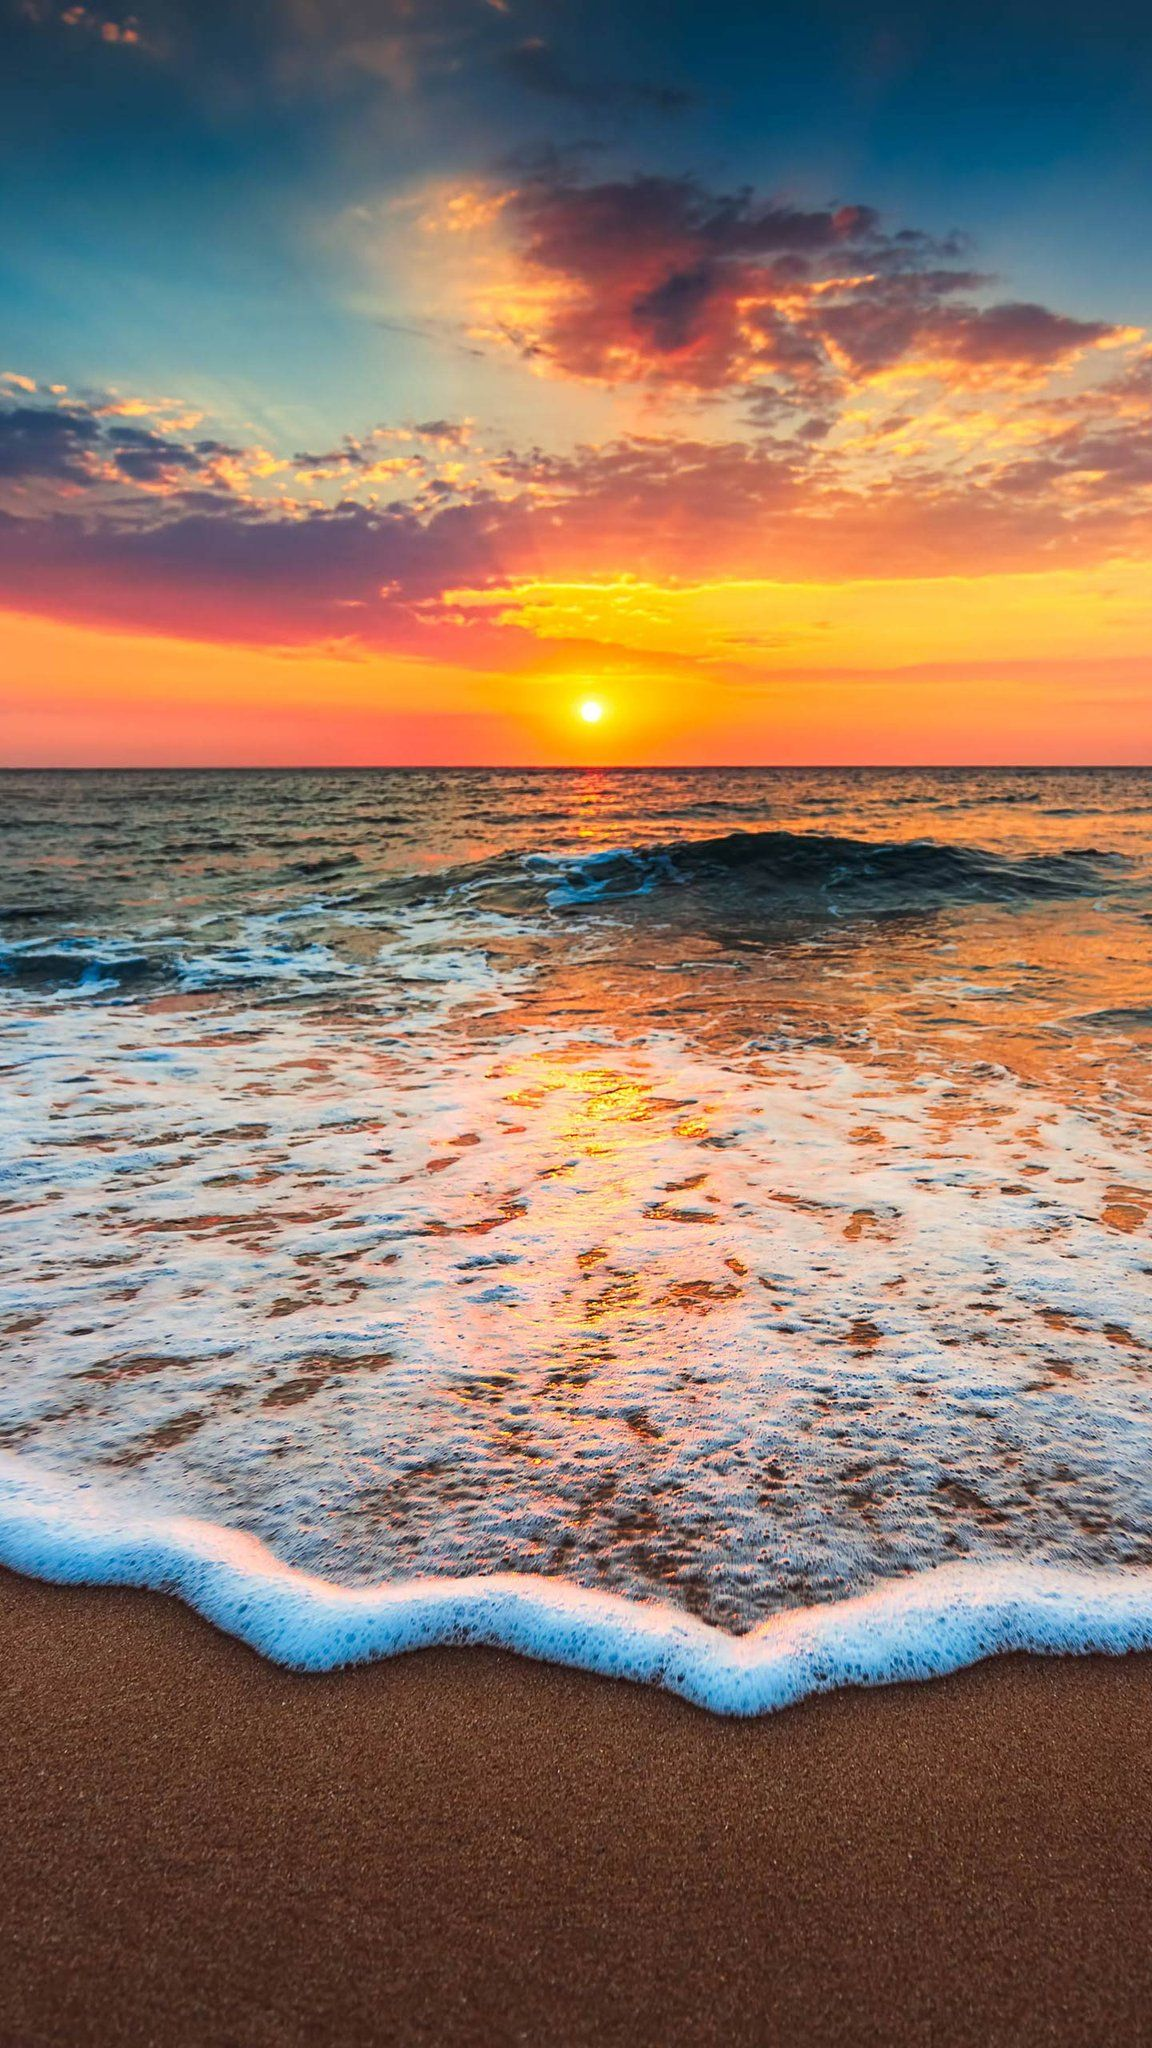 Naina El On Beach Sunset Photography Sunset Photography Beach Scenery